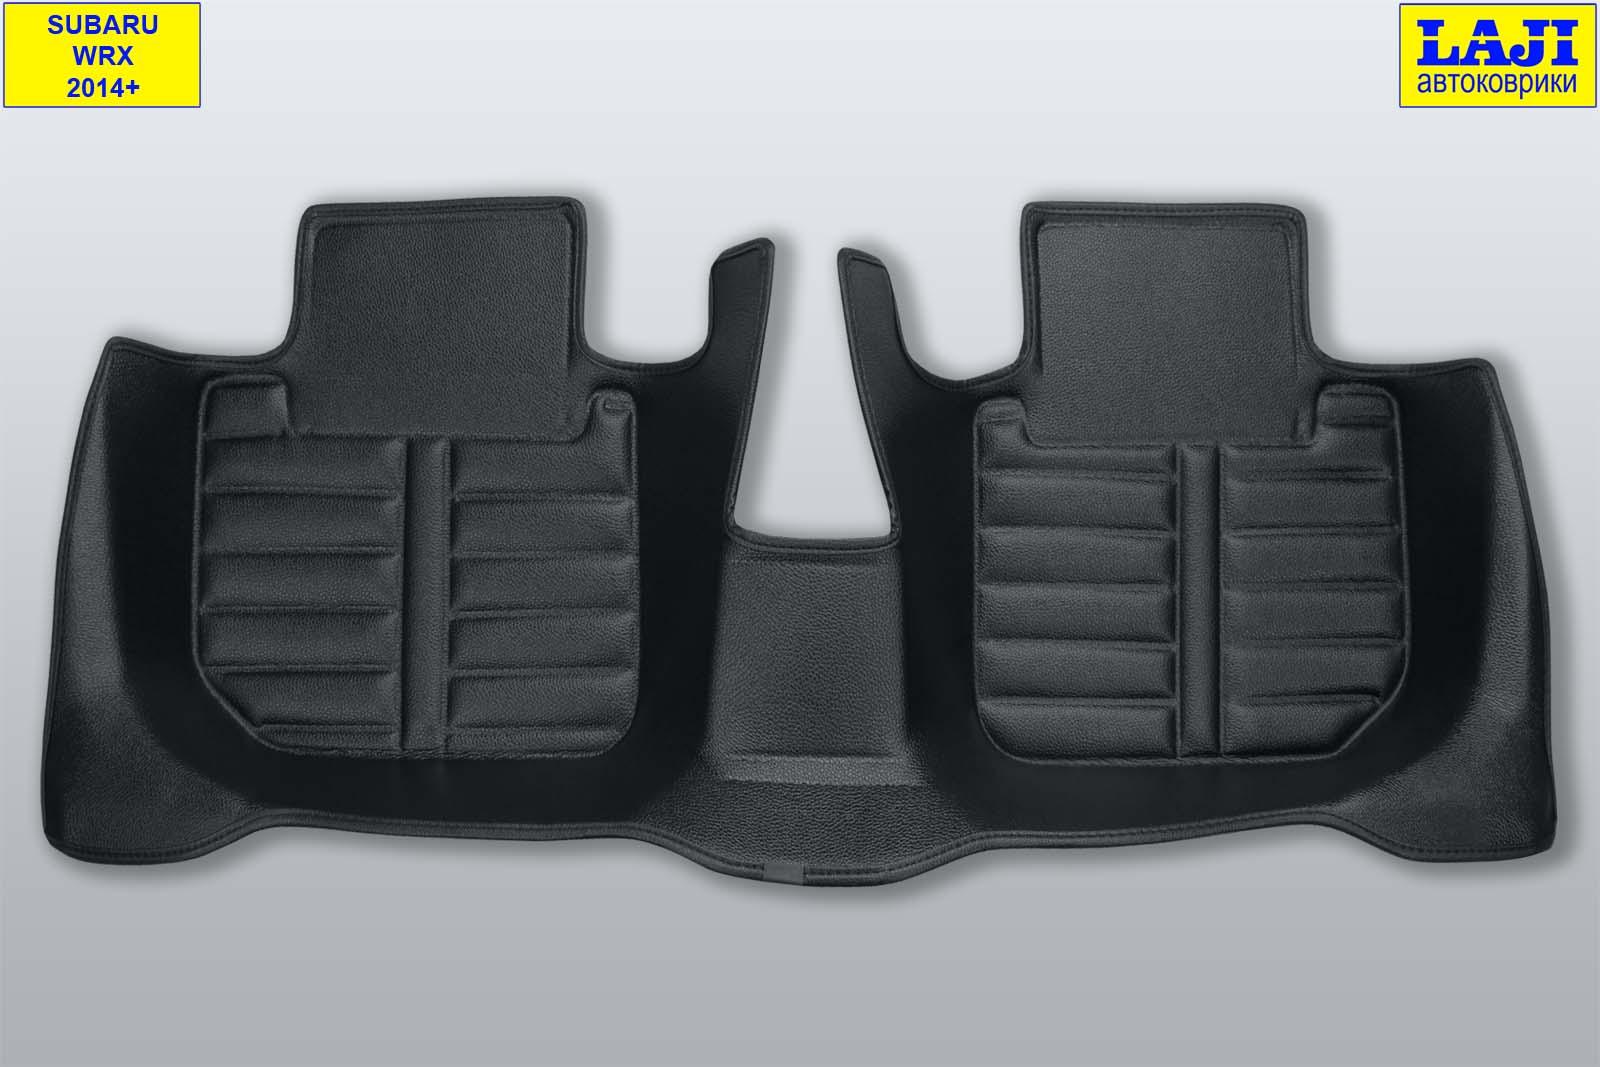 5D коврики в салон Subaru WRX 2014-н.в. 10